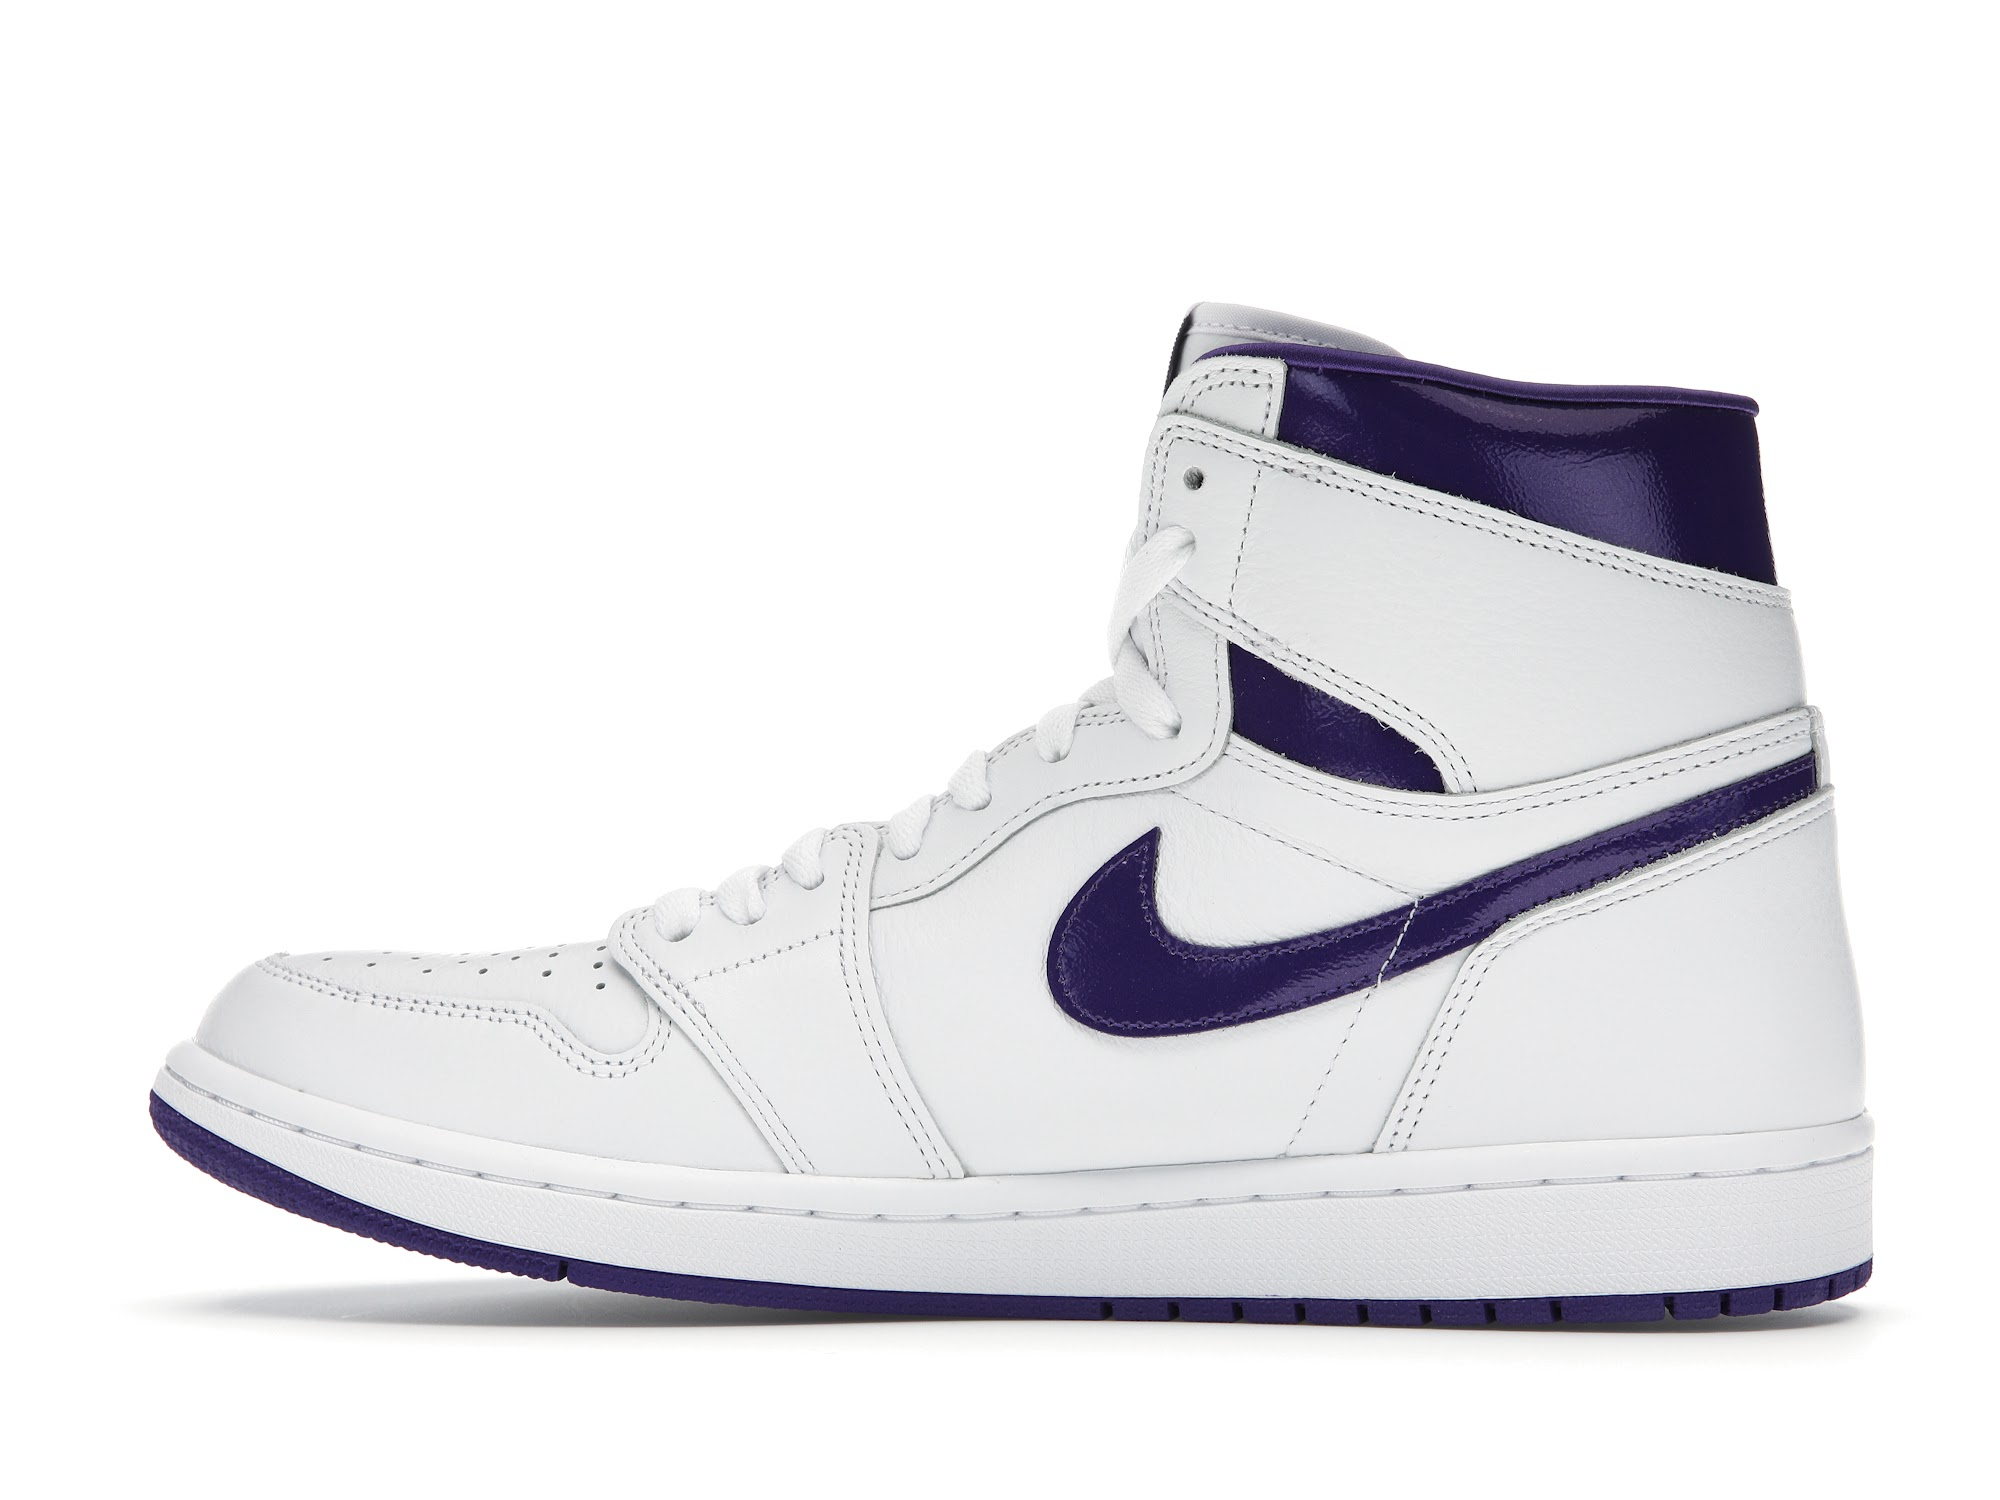 Jordan 1 Retro High Court Purple (W) - CD0461-151